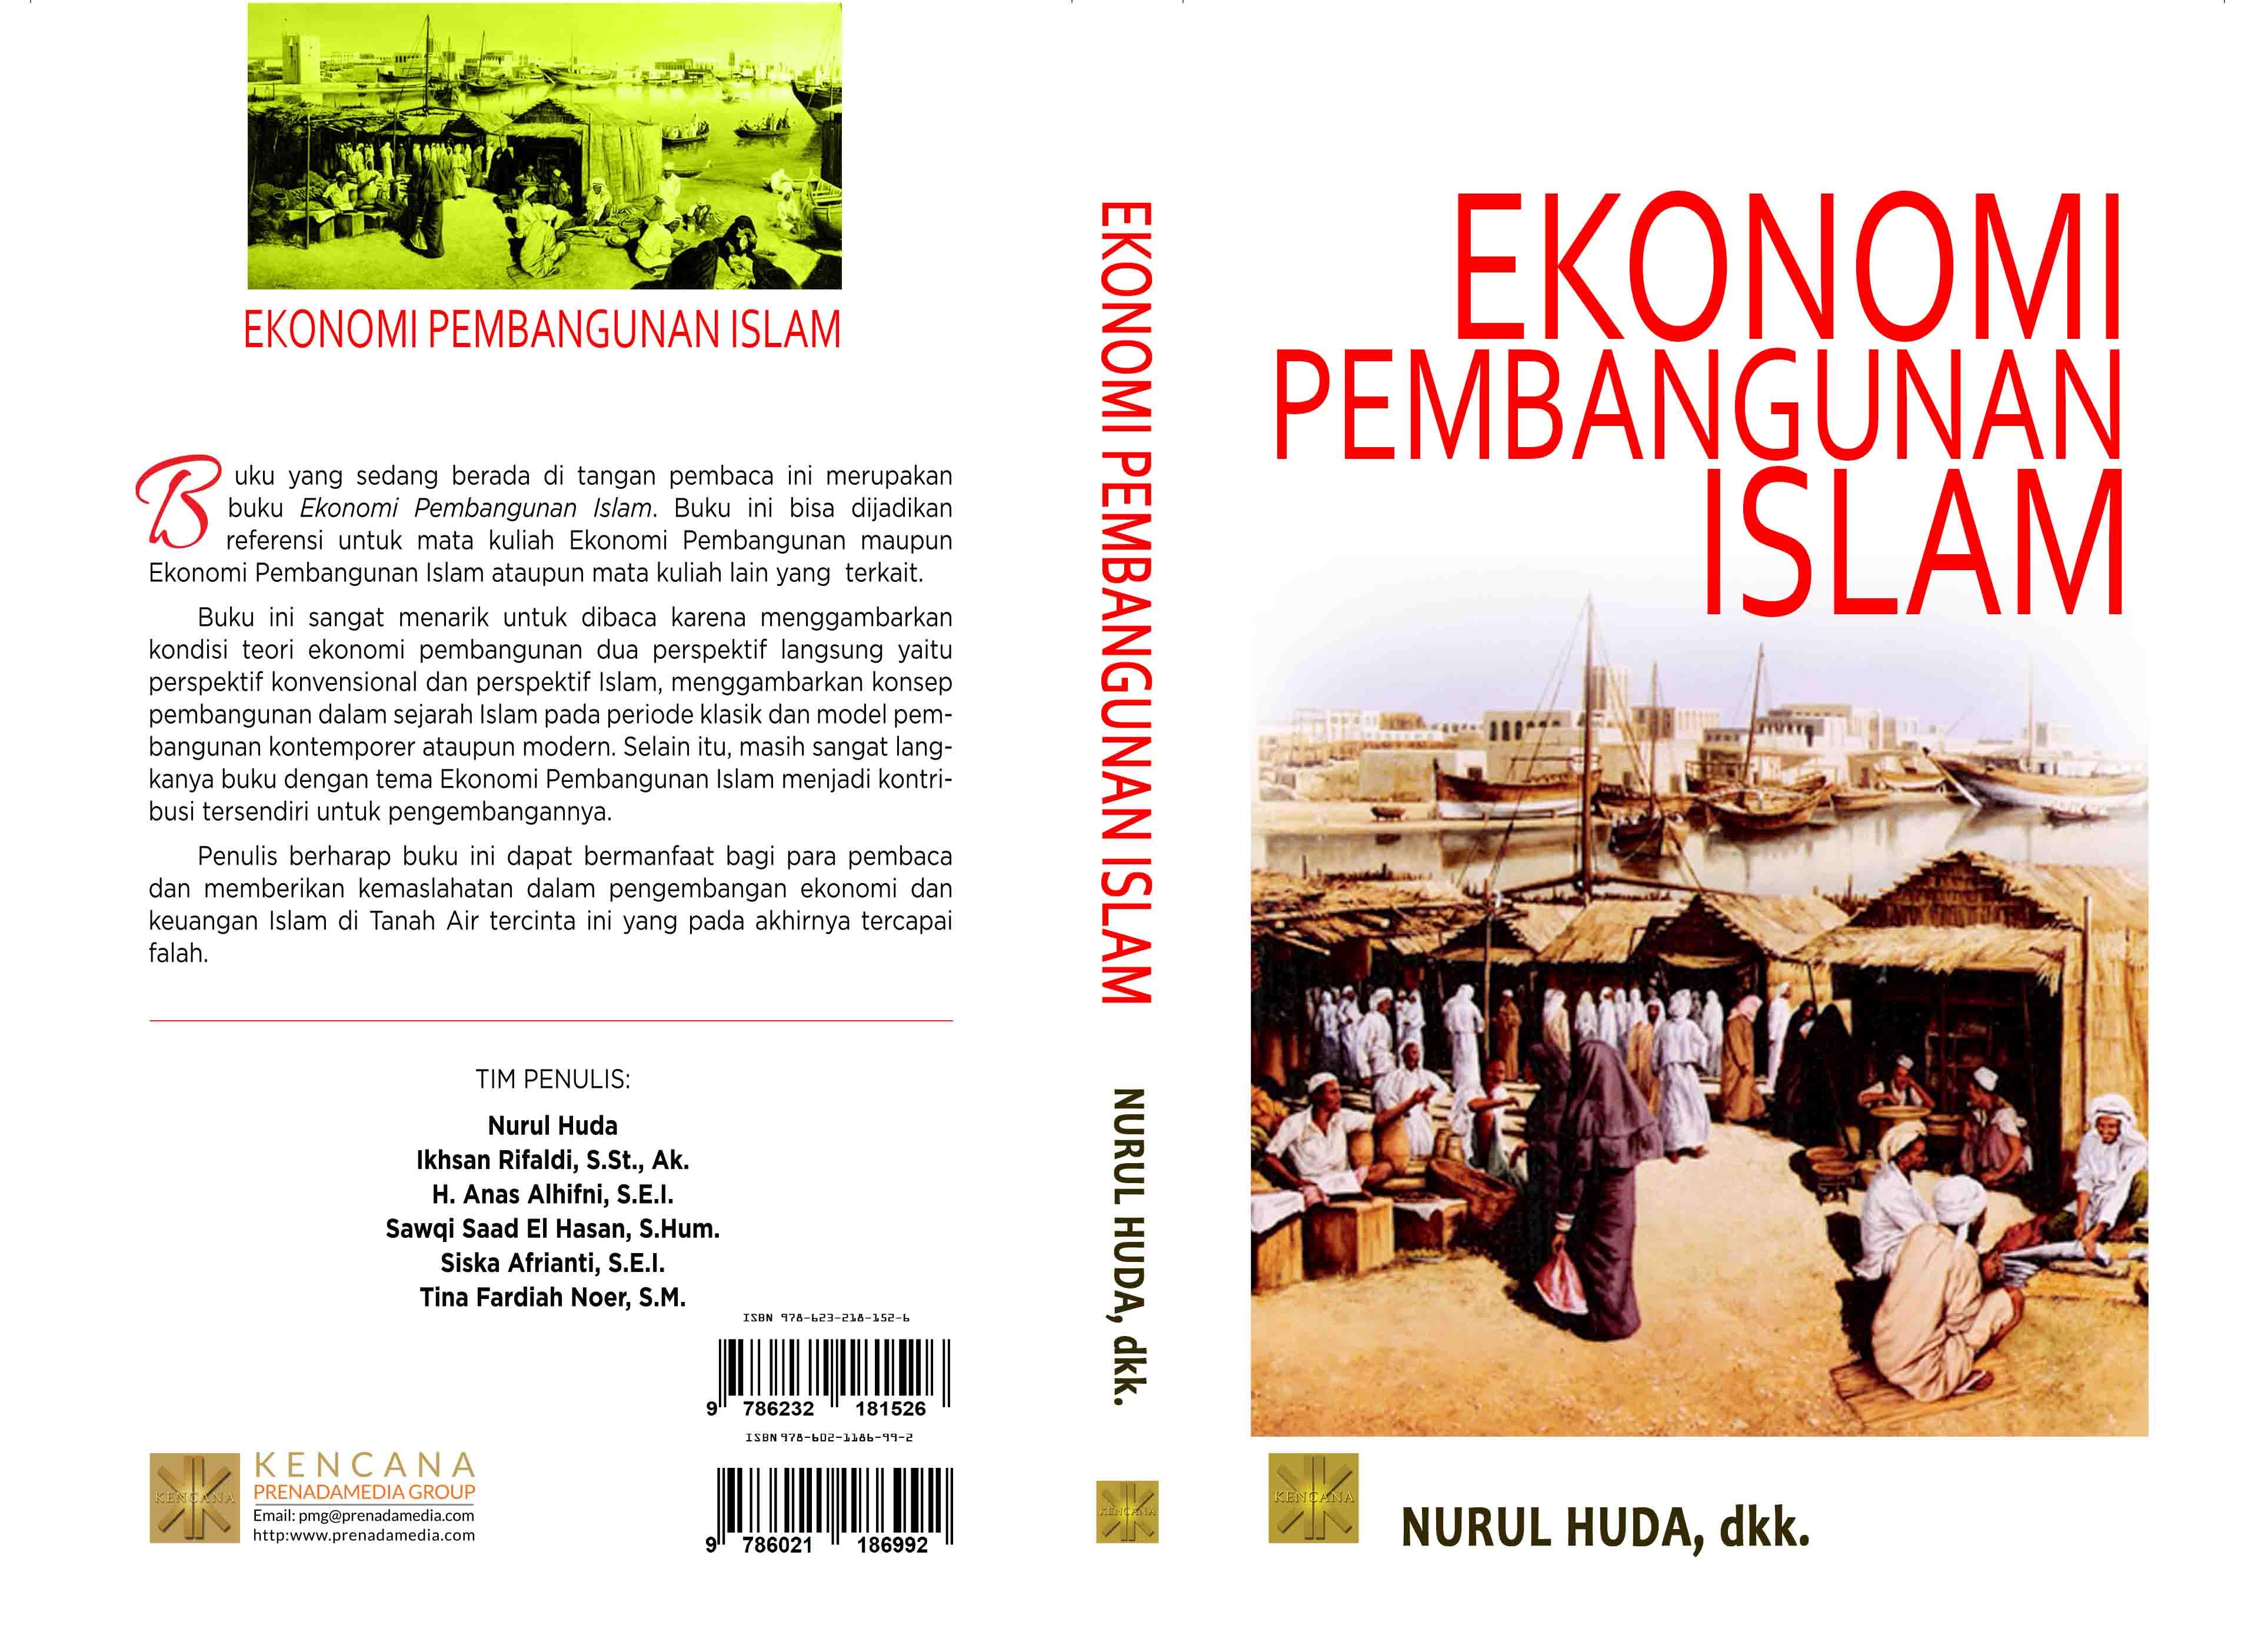 Ekonomi pembangunan Islam [sumber elektronis]